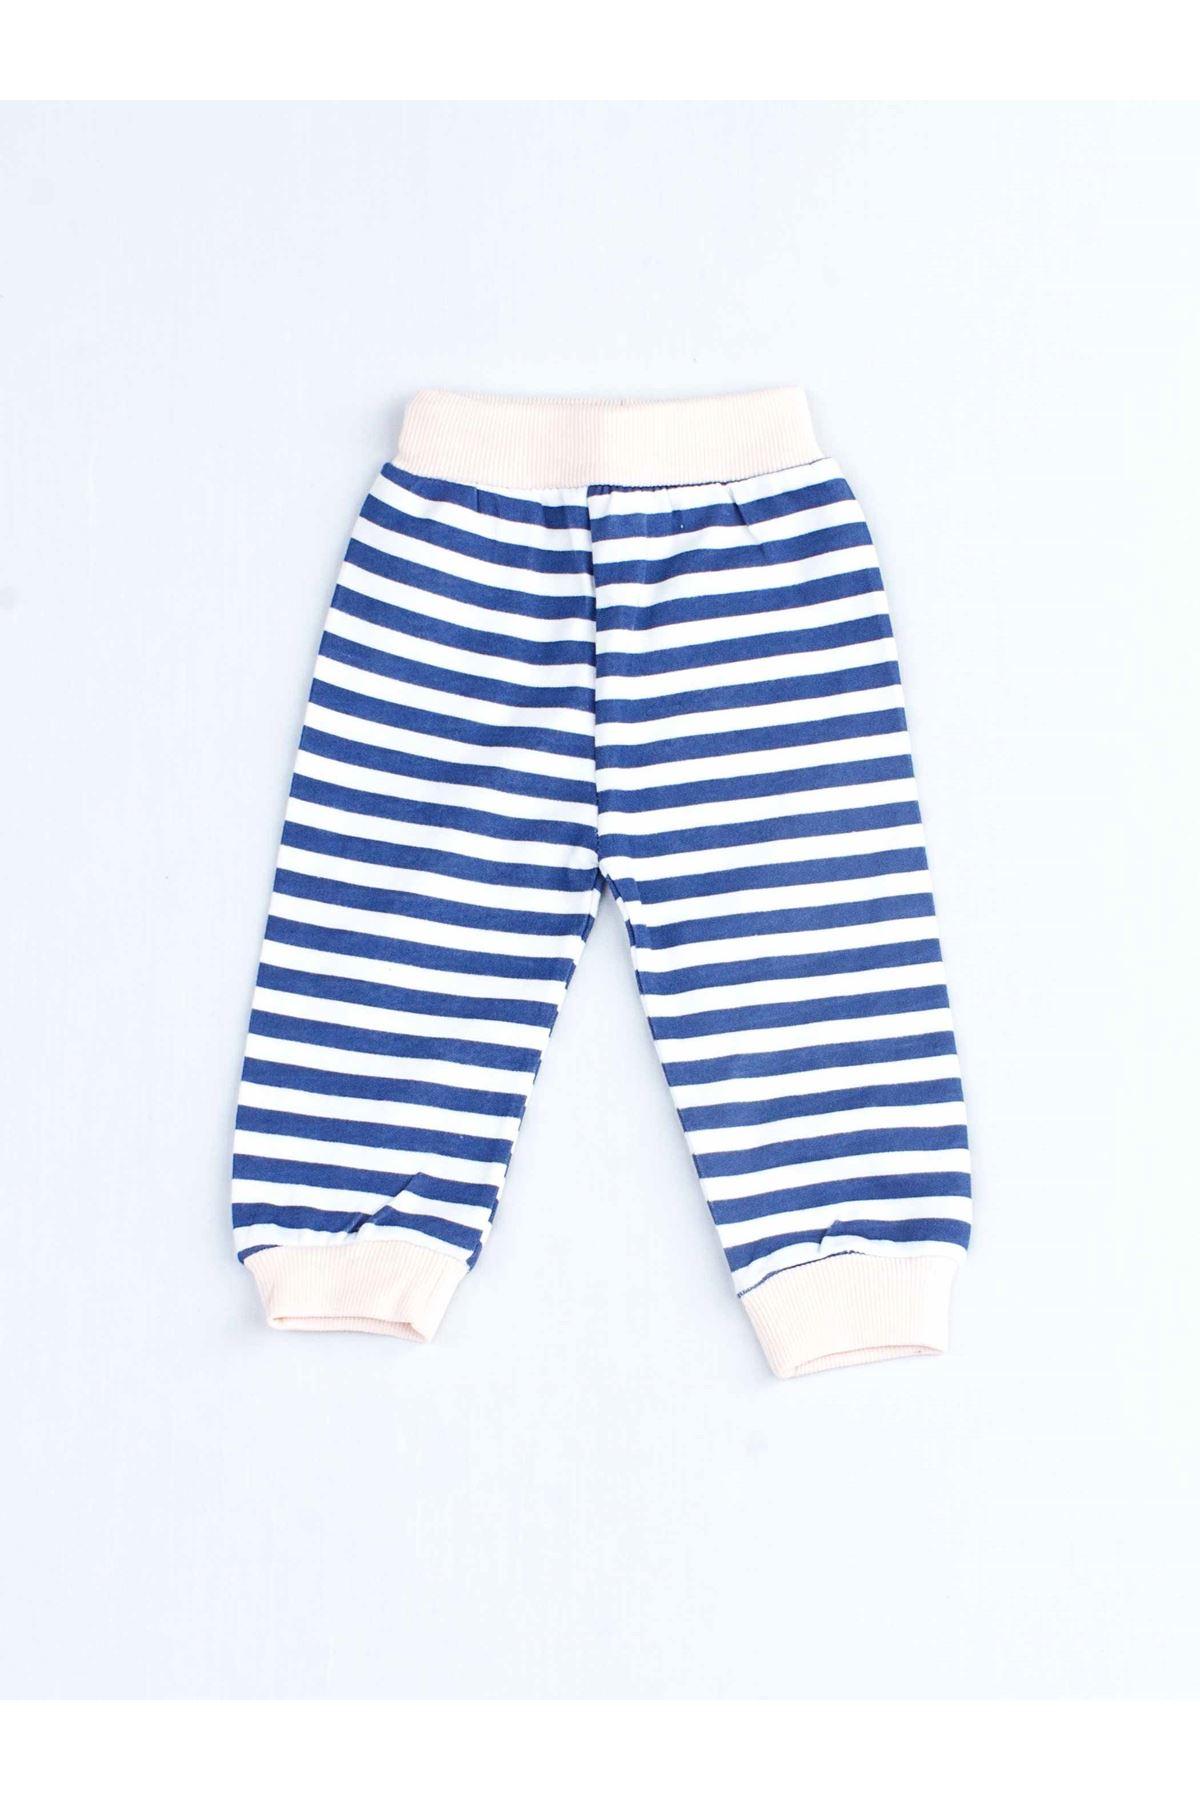 Pudra Kız Bebek Pijama Takımı